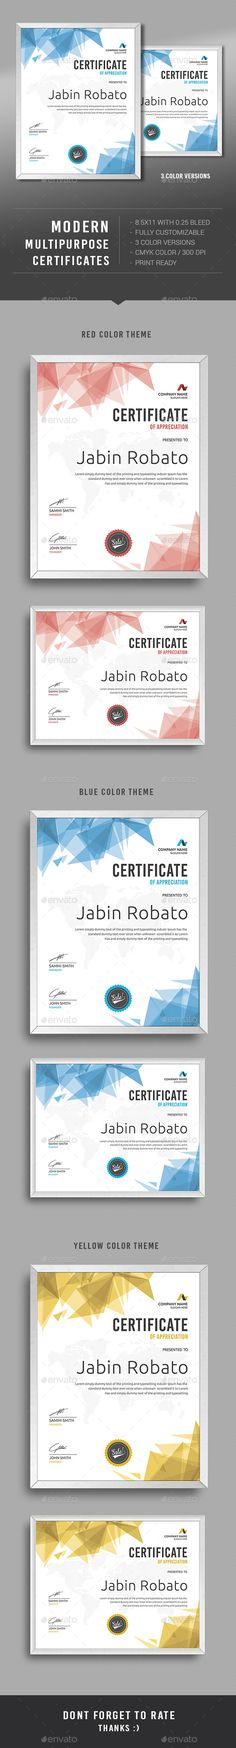 Modern Multipurpose Certificates Template PSD. Download here: http://graphicriver.net/item/modern-multipurpose-certificates/12869634?ref=ksioks